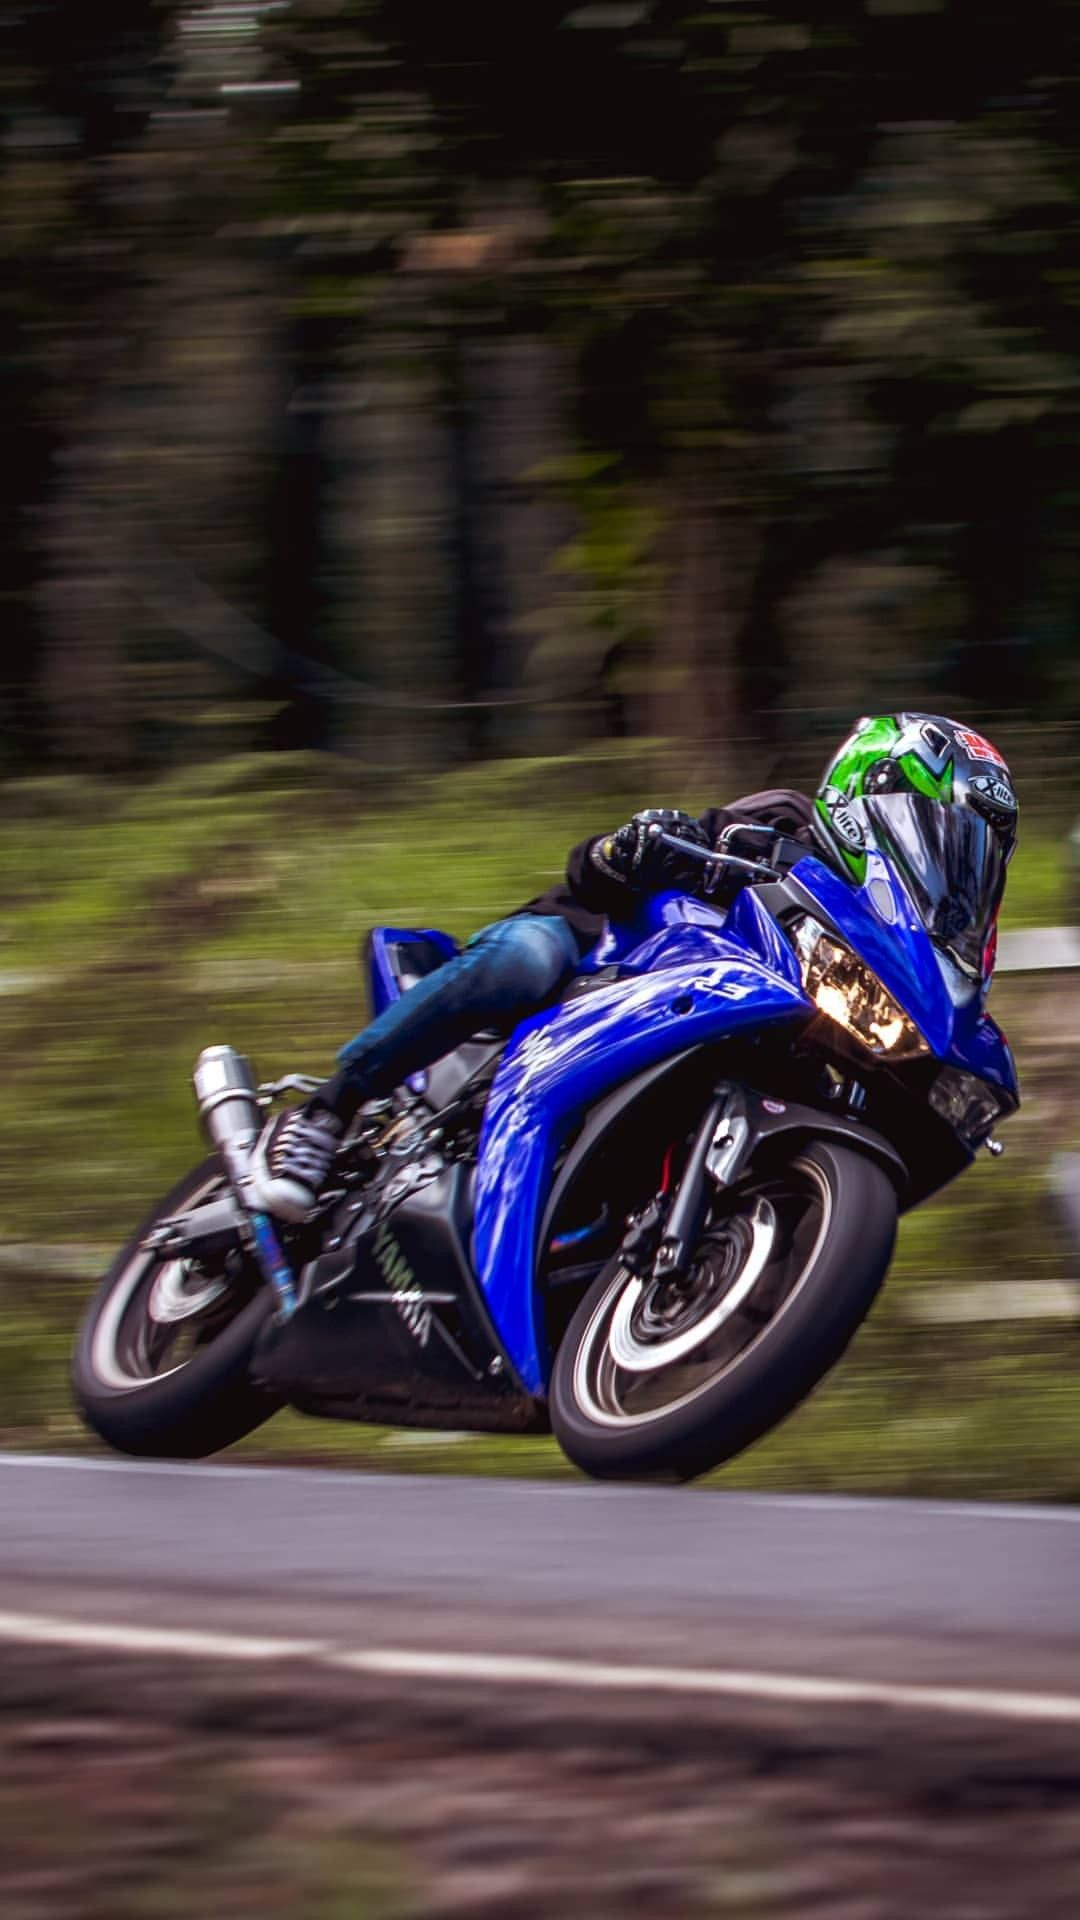 Pin de March em 2. Yamaha Sport Bike